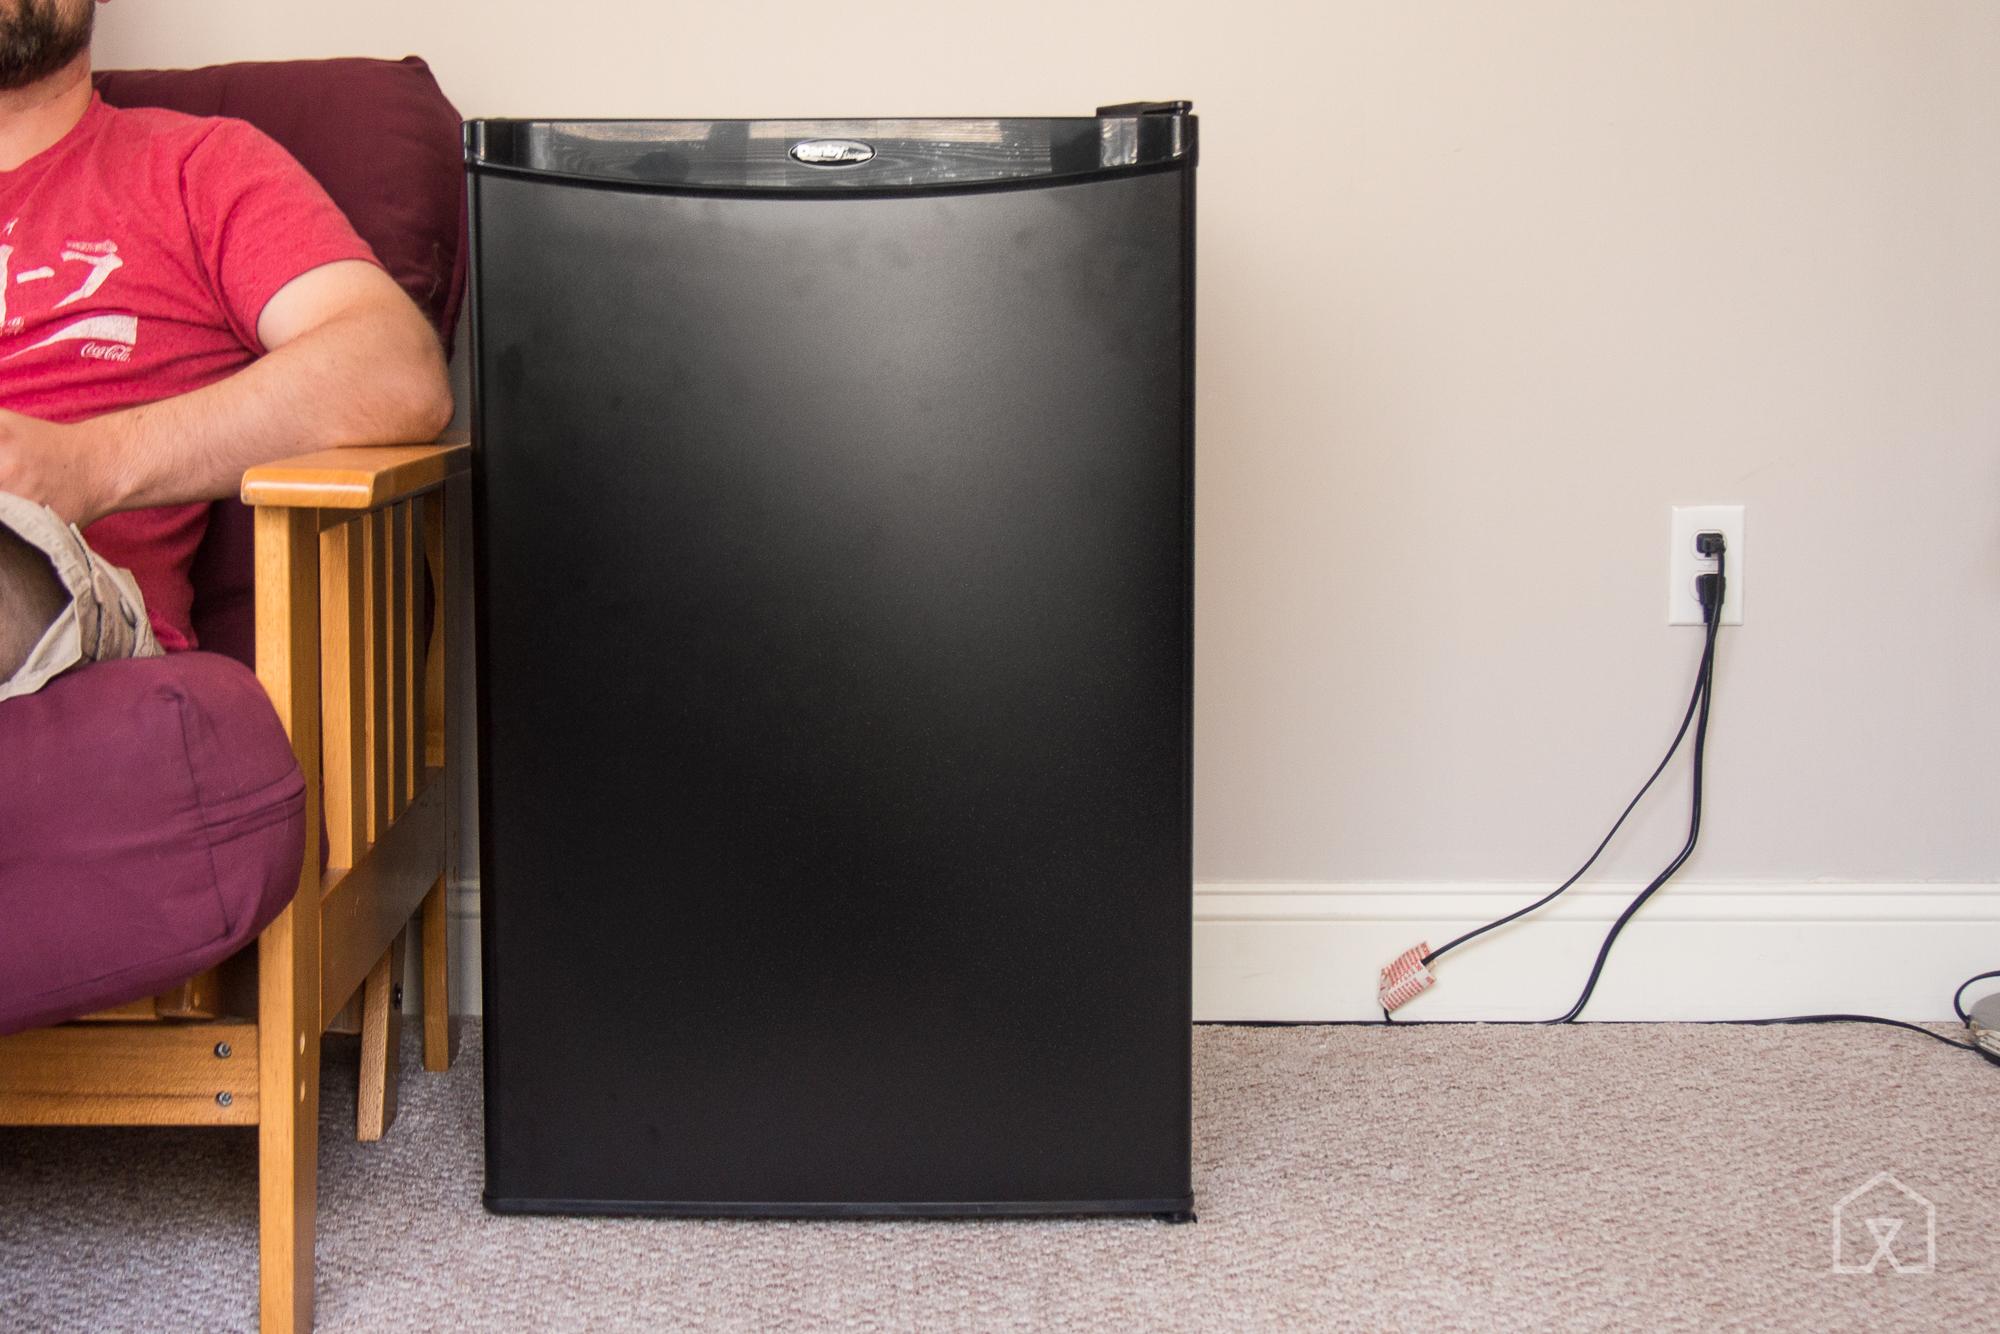 The best mini fridge